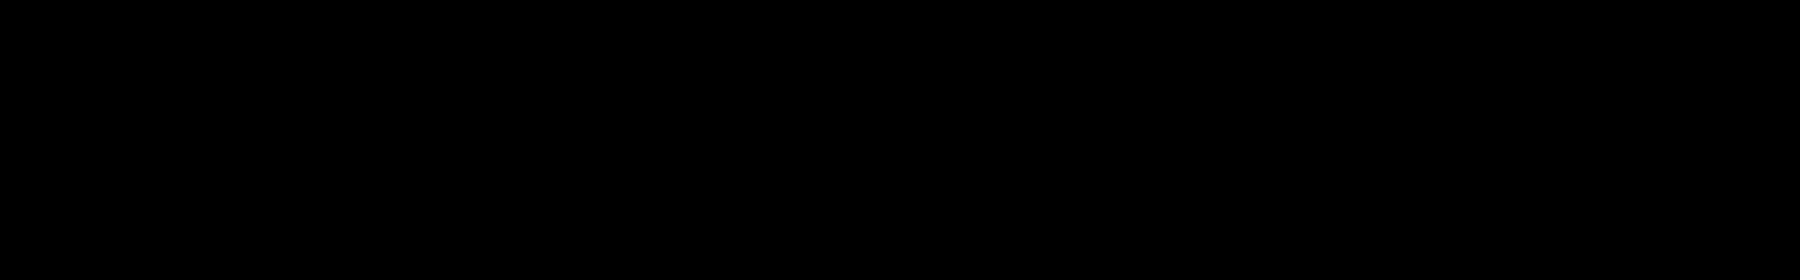 Atmospherica 3 audio waveform